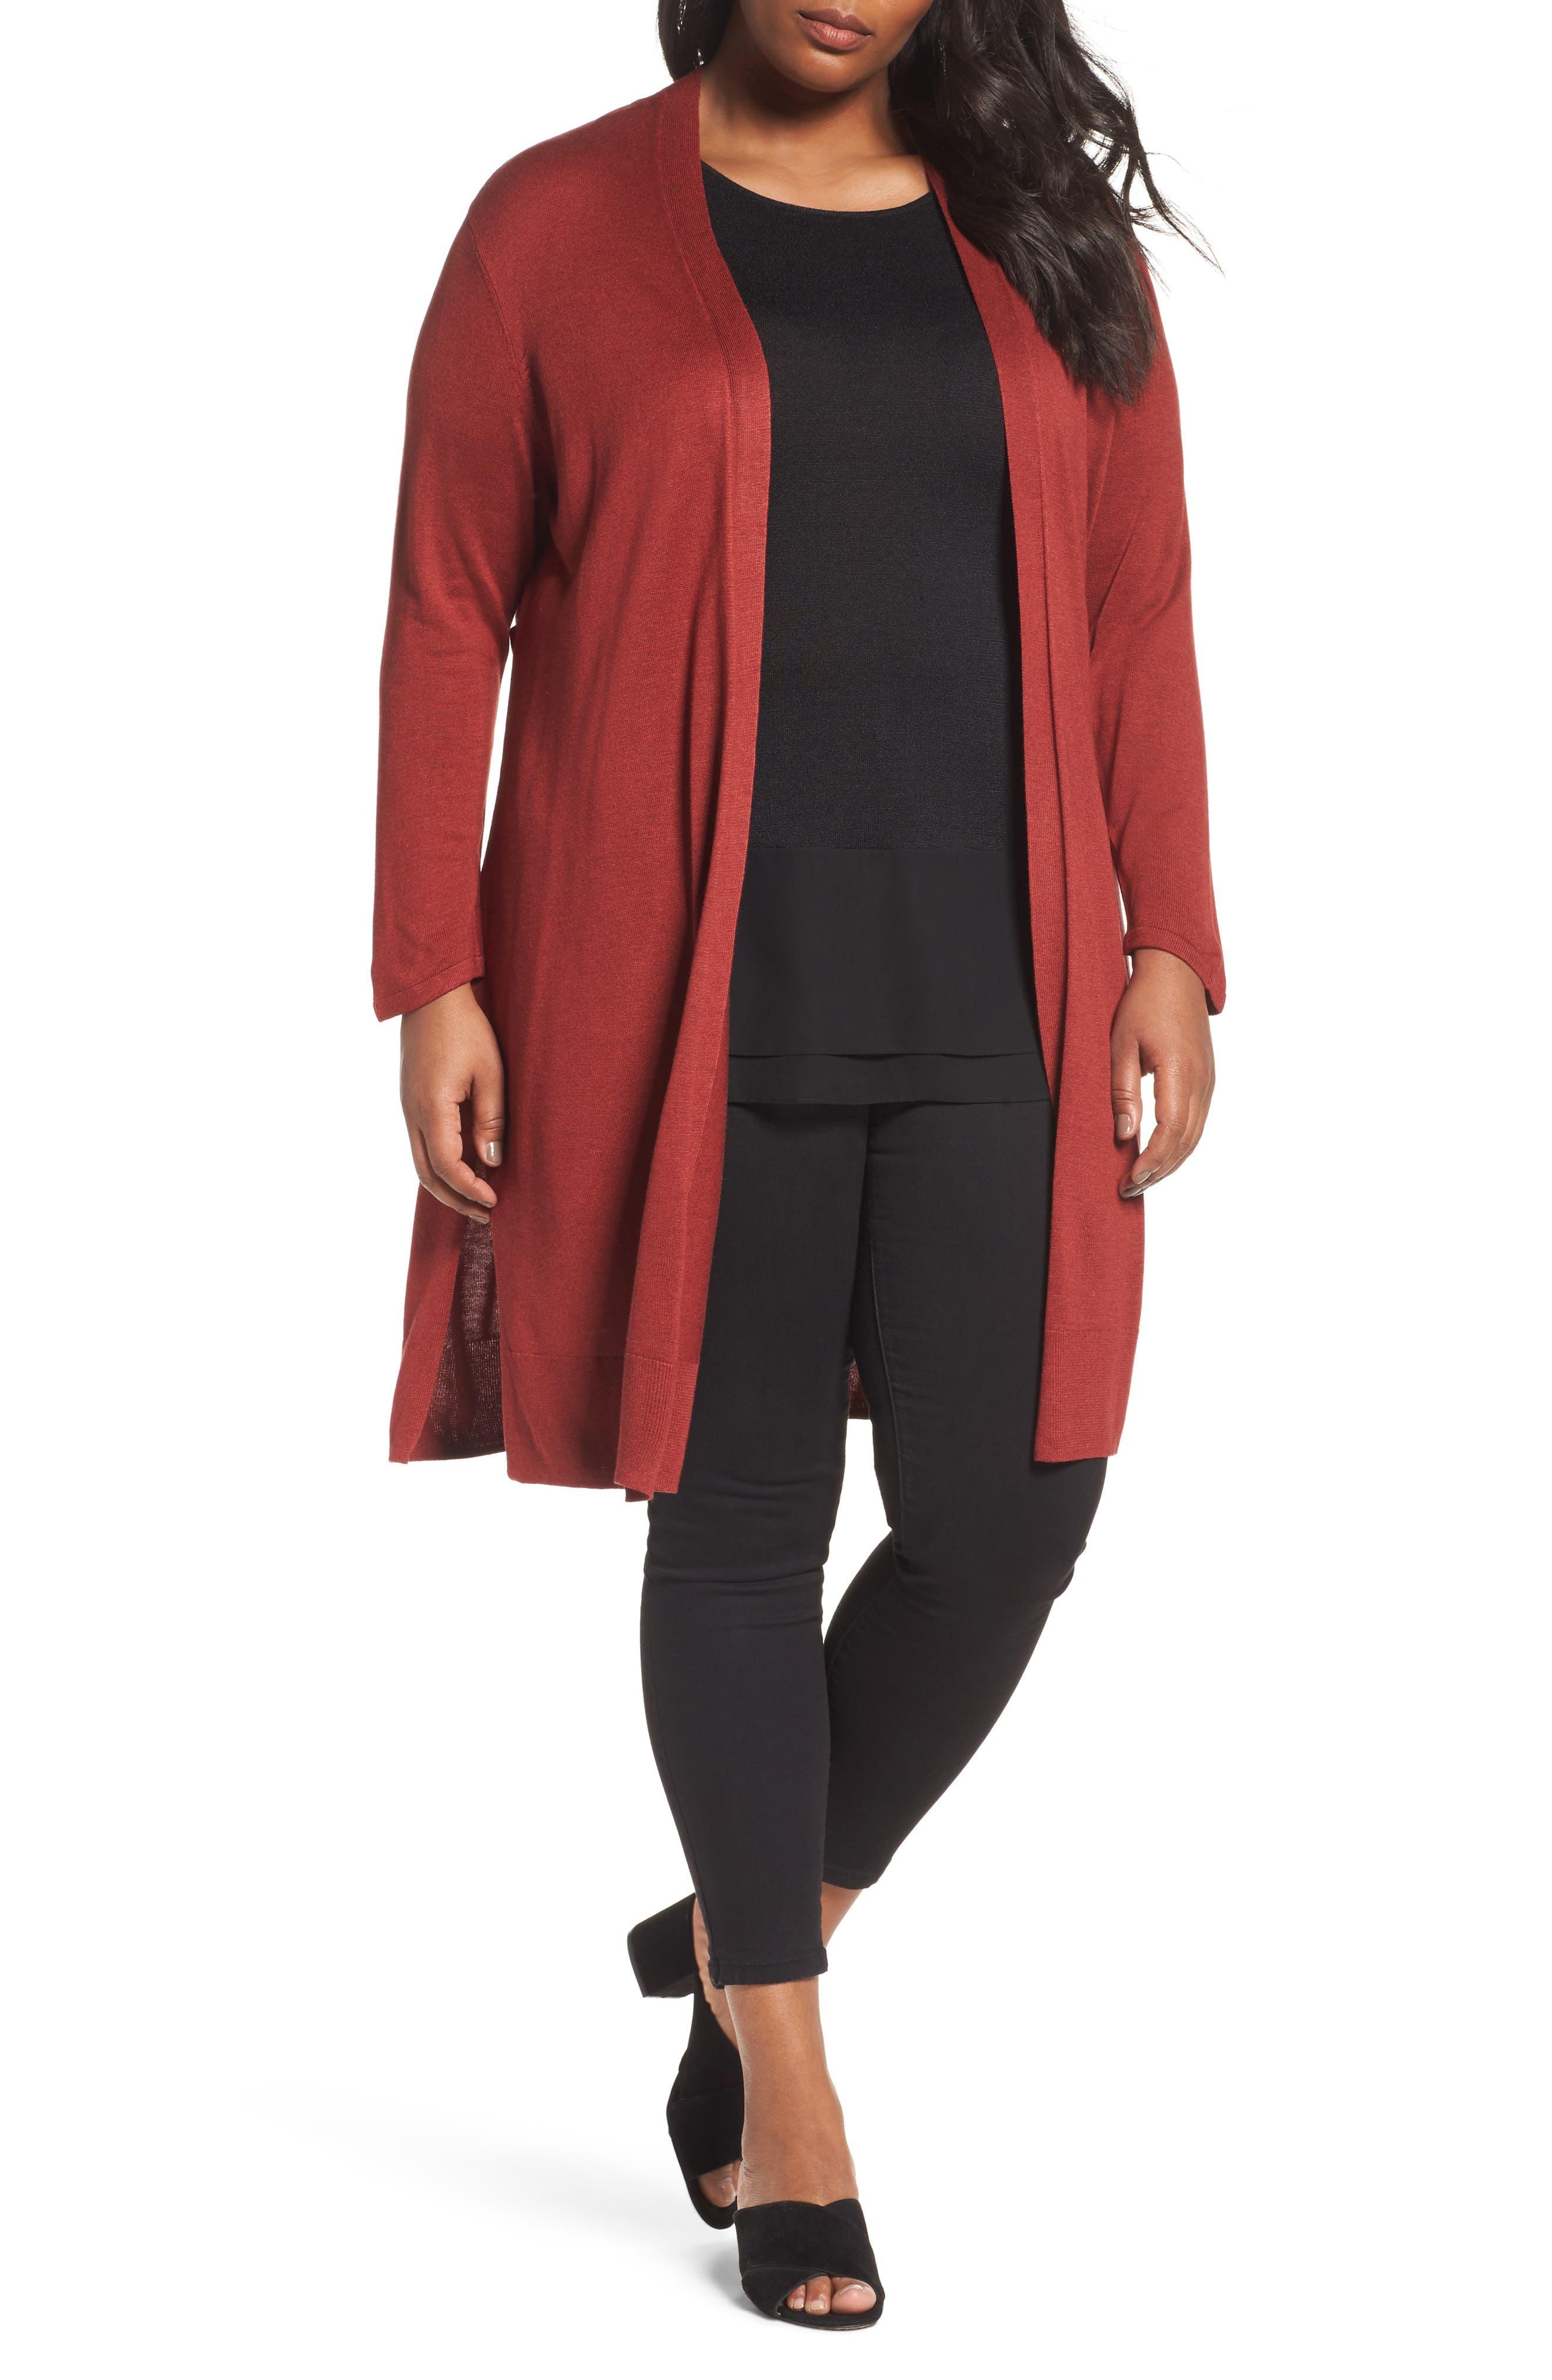 Main Image - NIC+ZOE Silk Blend Trench Cardigan (Plus Size)